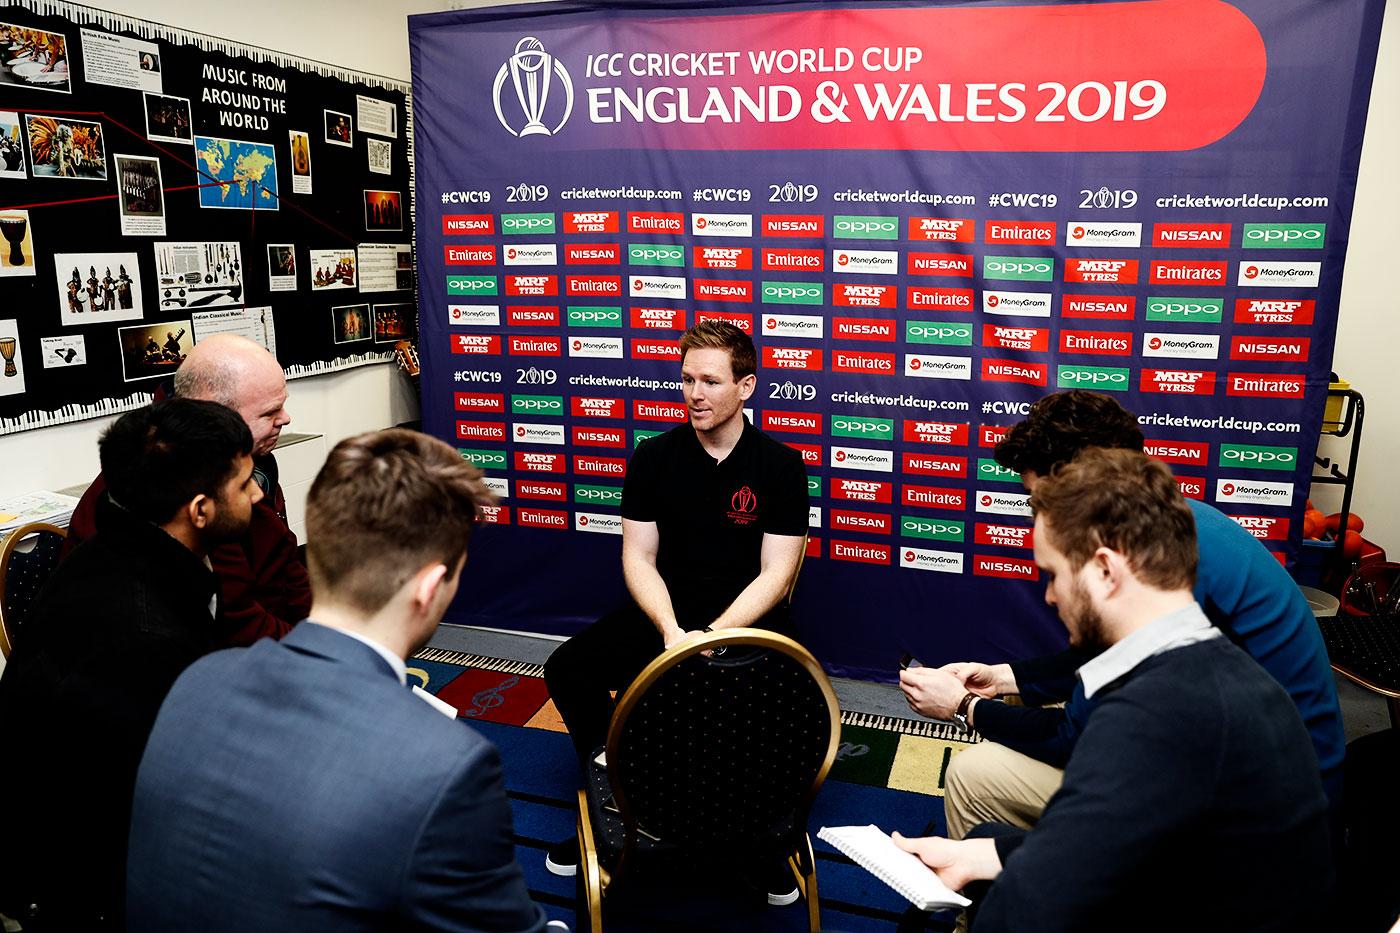 Over time Morgan has grown more comfortable in his role as an England team spokesperson